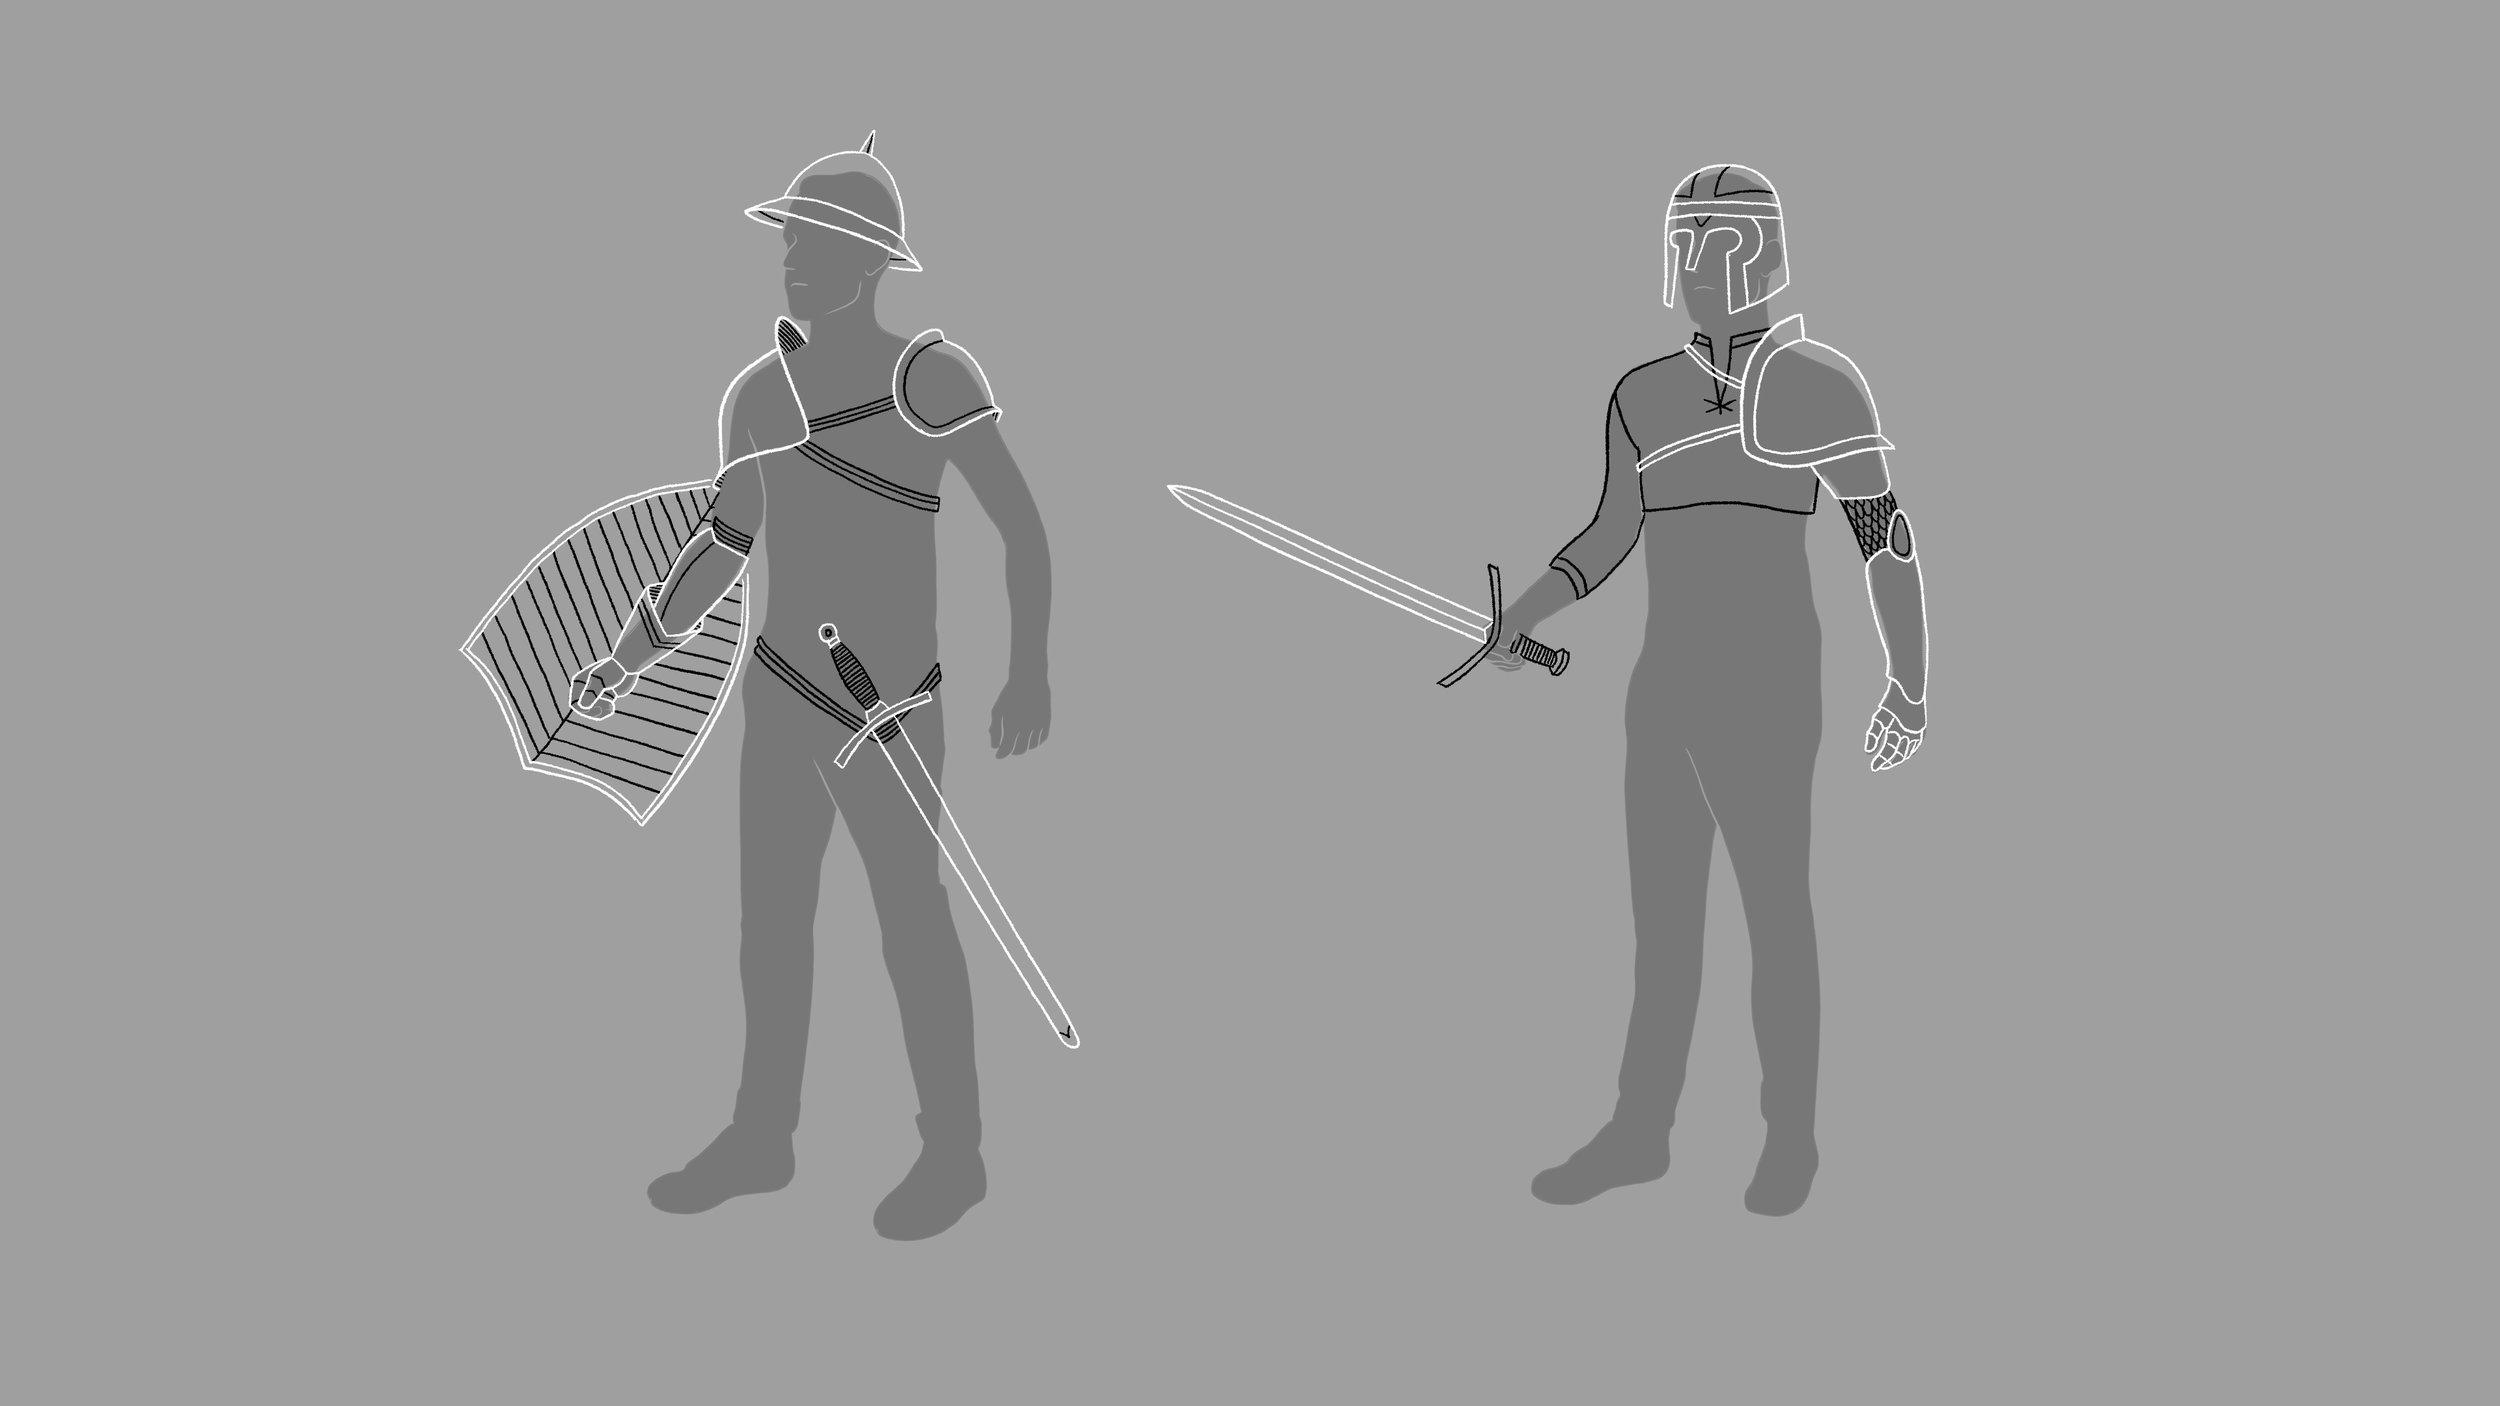 Knights_3_004.jpg